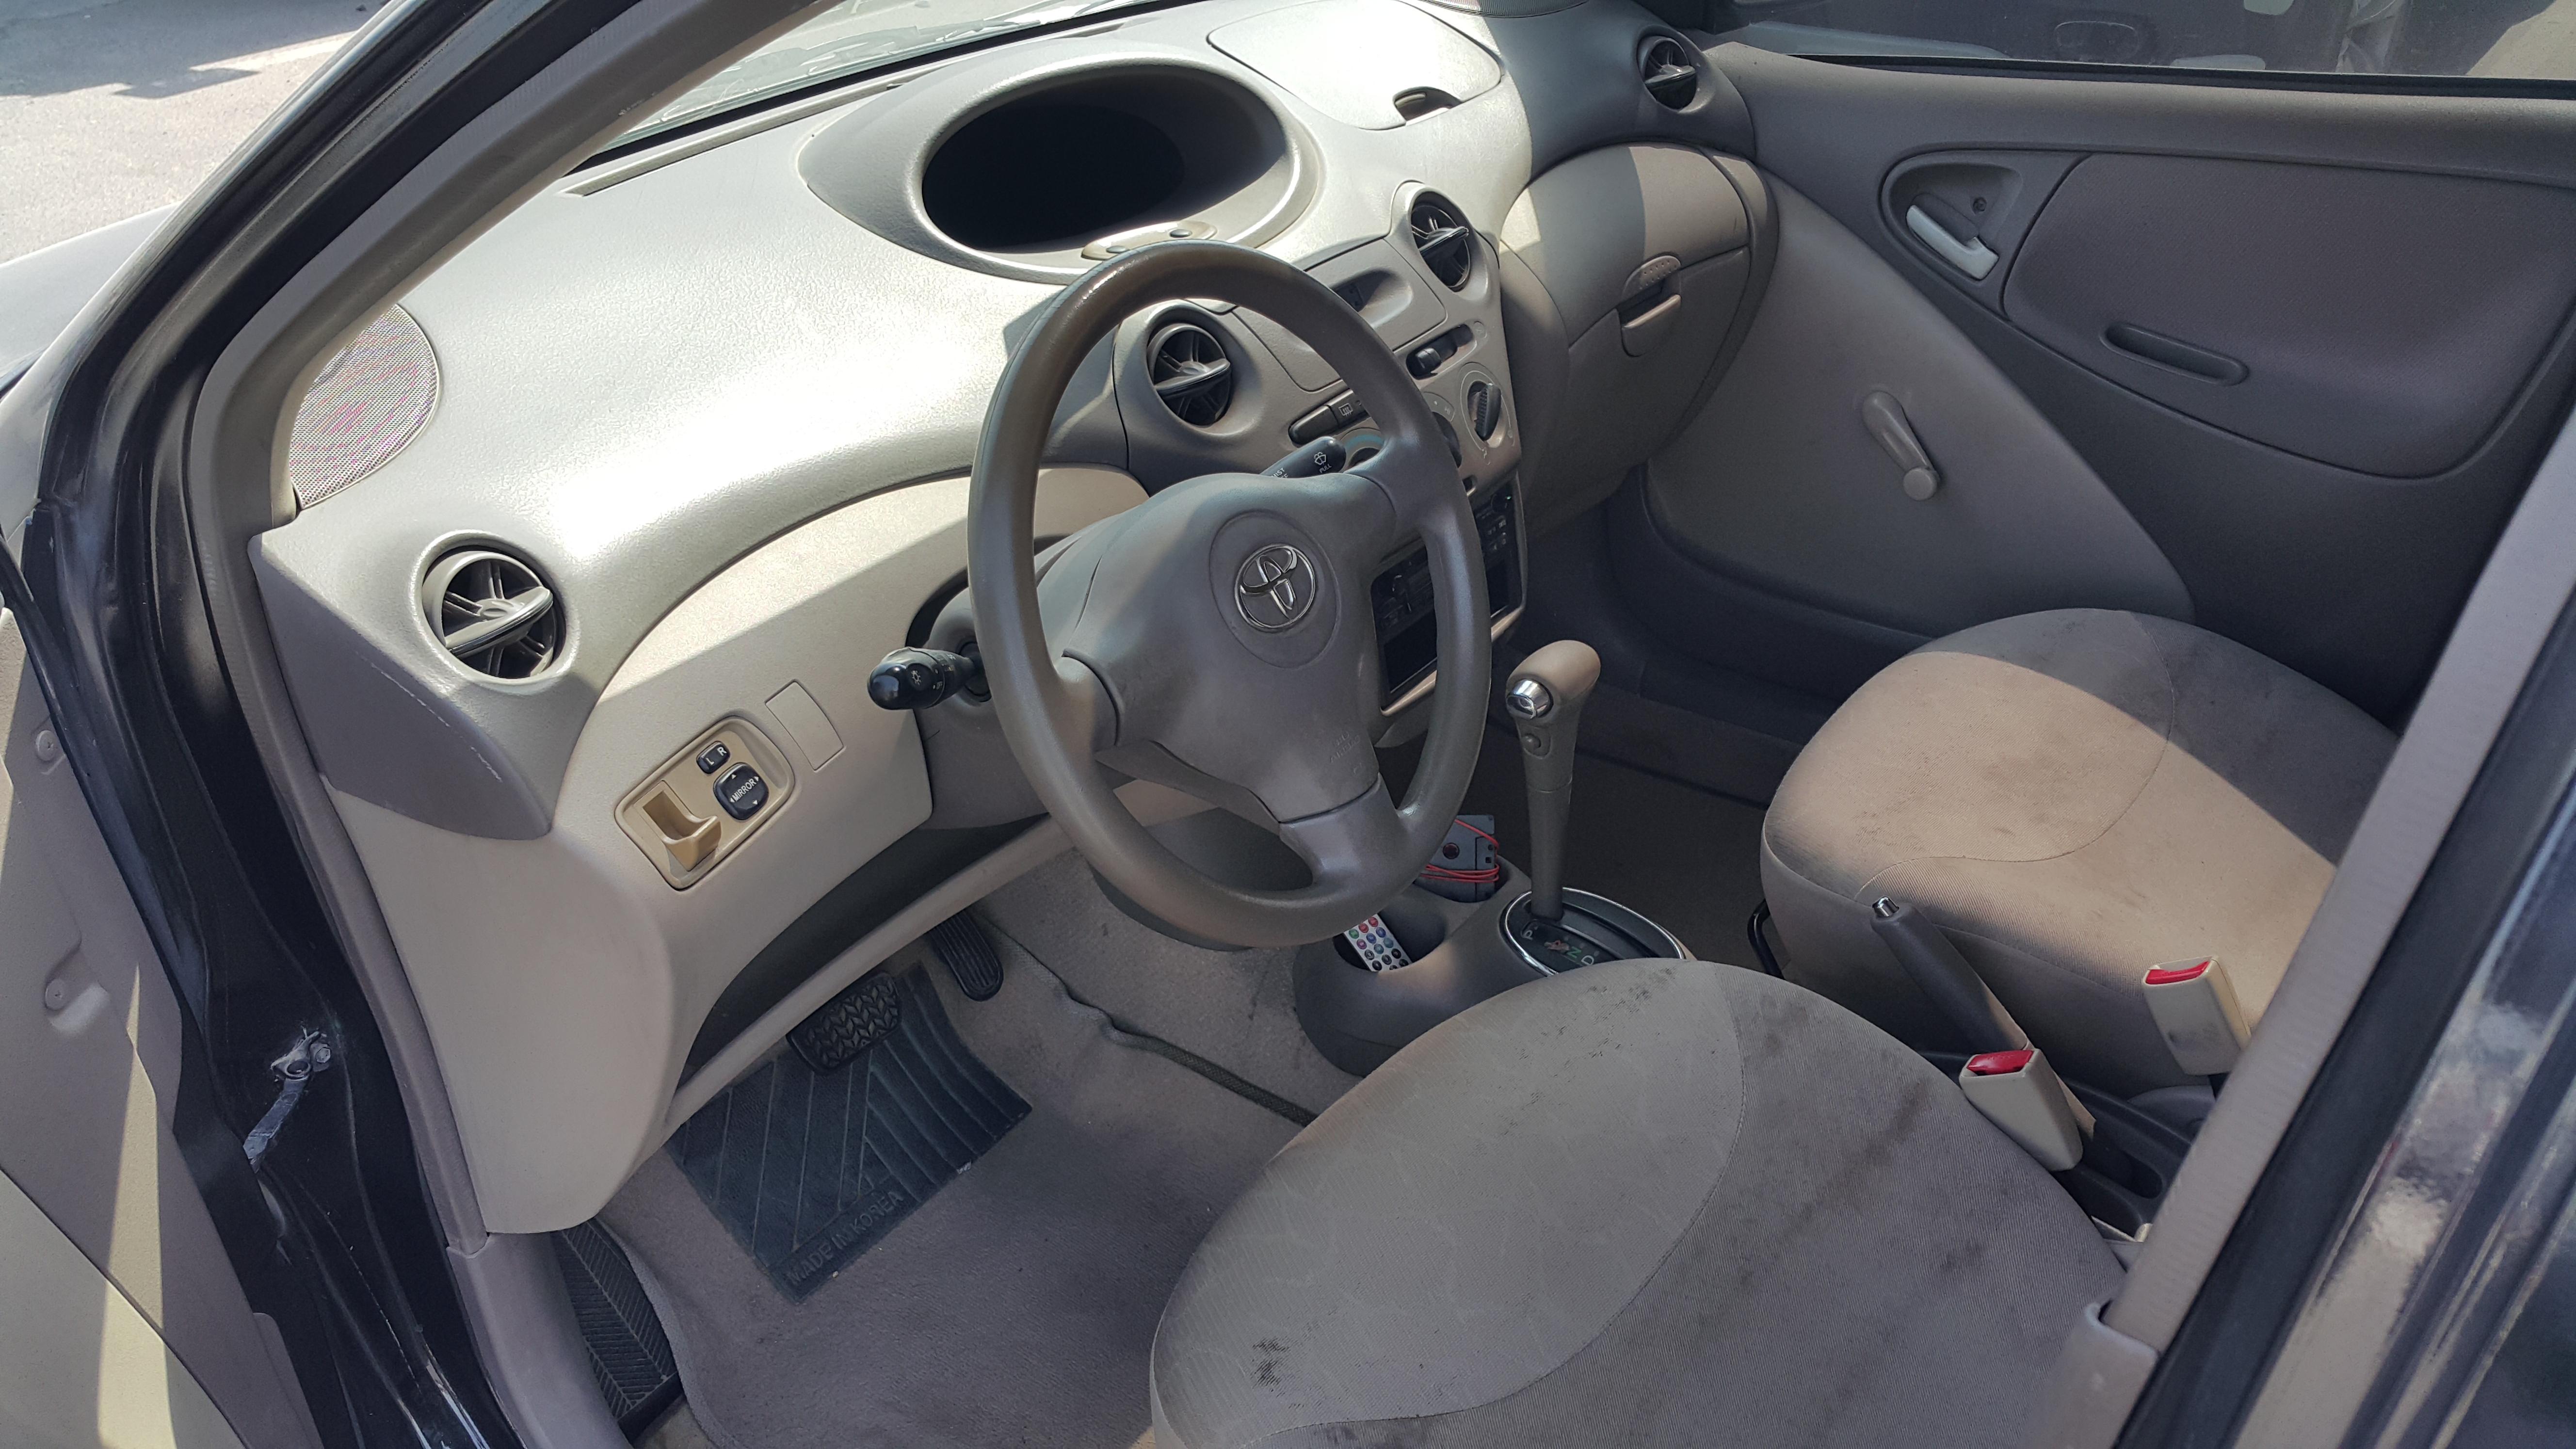 Kekurangan Toyota Yaris 2004 Tangguh